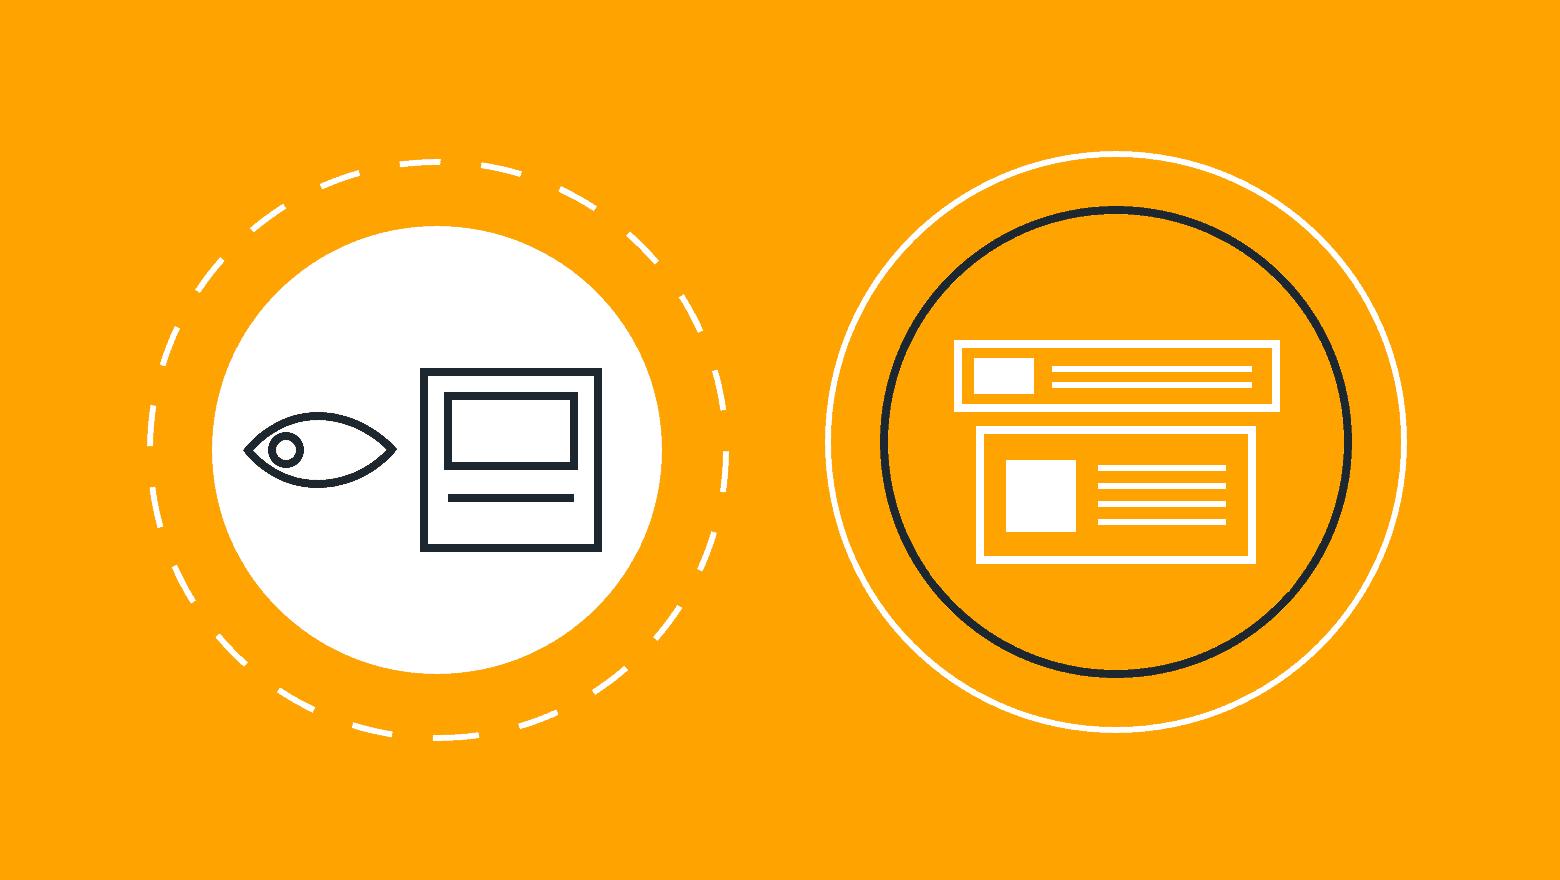 remarketing vs retargeting icon